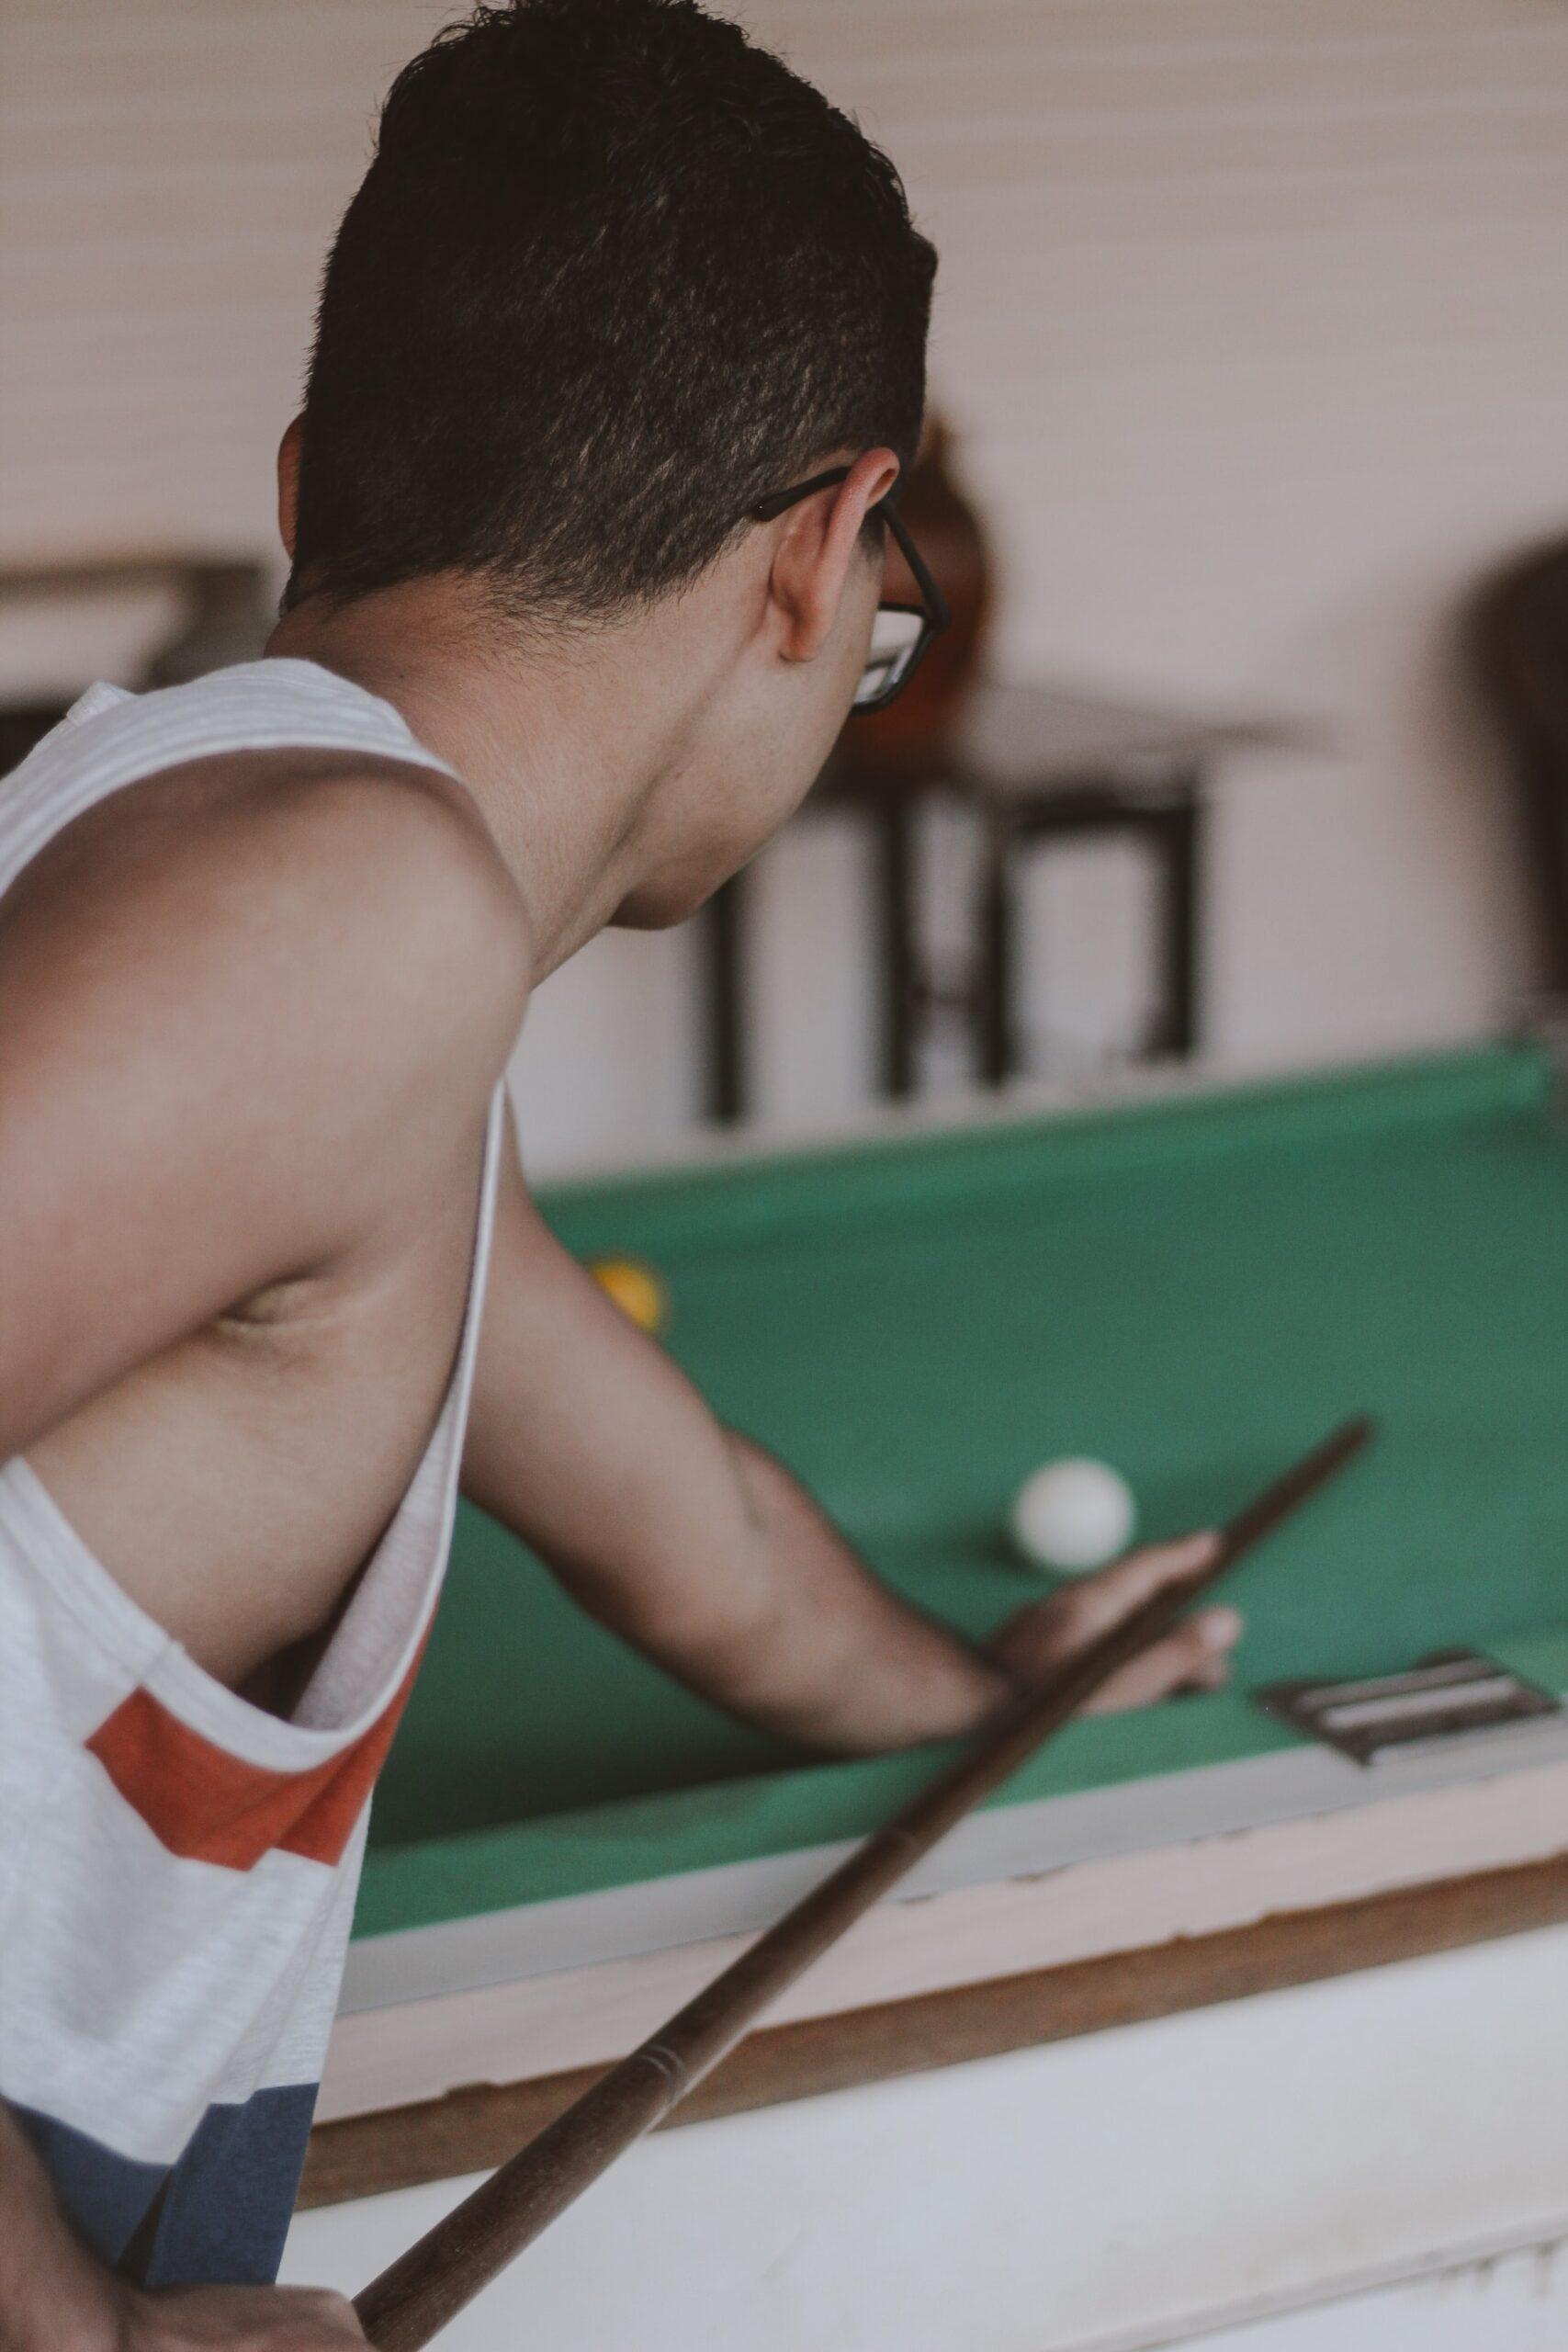 Man in white tank top playing billiards